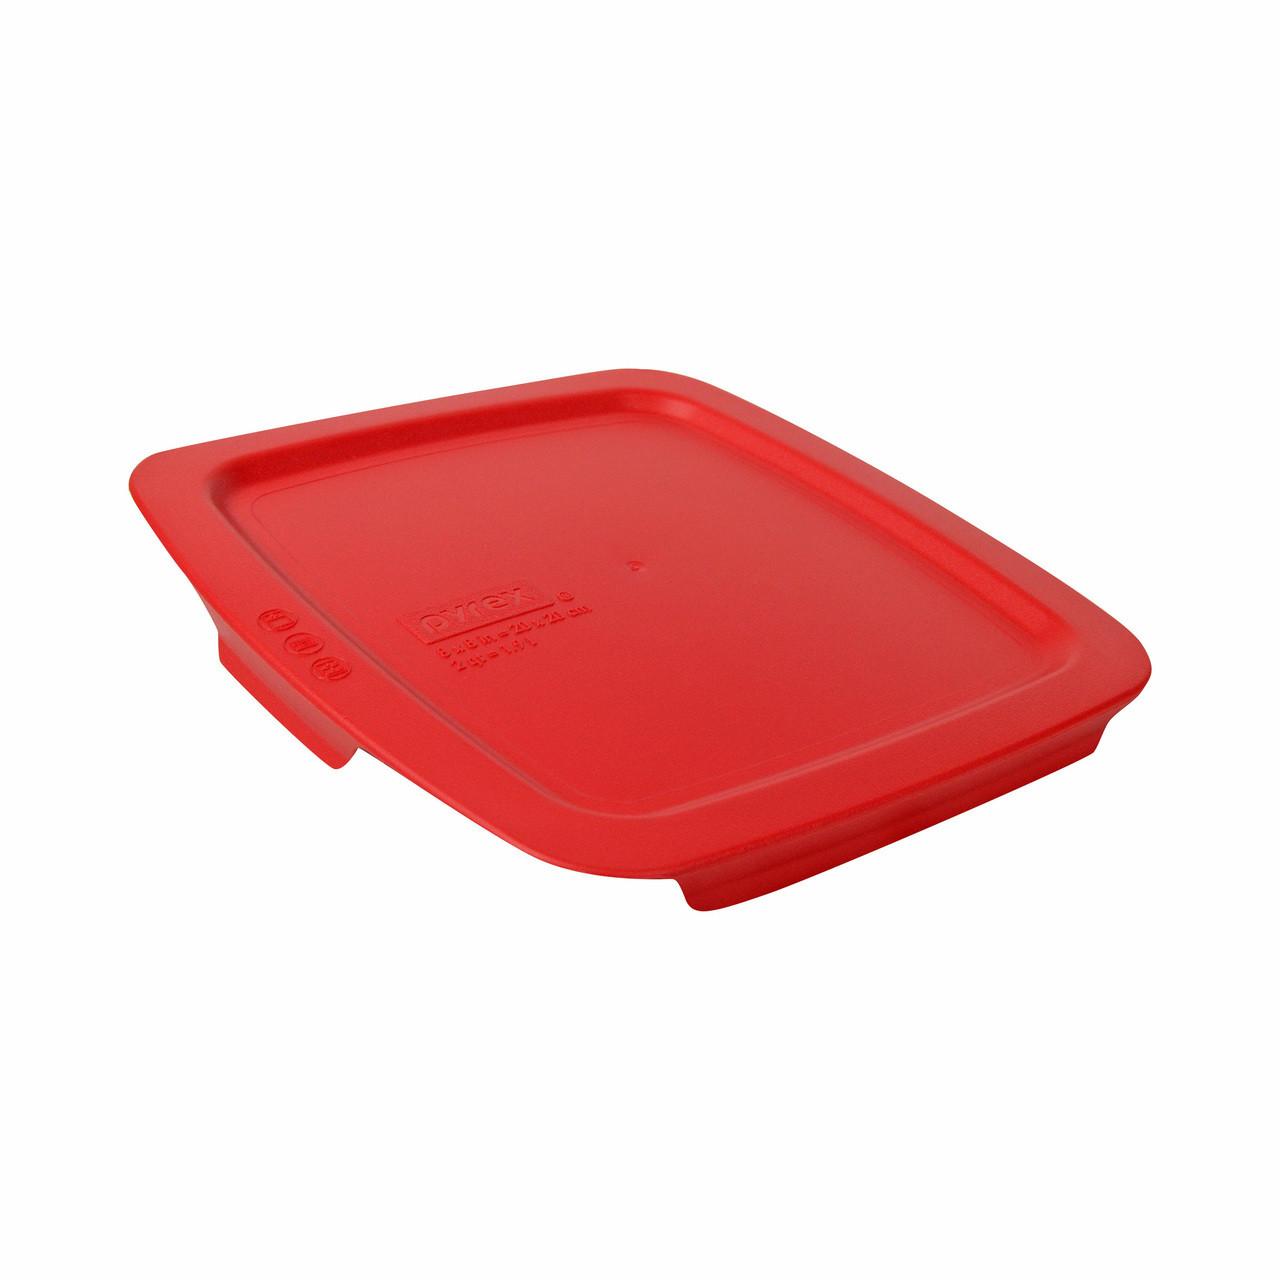 Will NOT Fit Easy Grab Baking Dish 4 Pyrex 222-PC 2 Quart Dark Blue 8 x 8 Baking Dish Lids